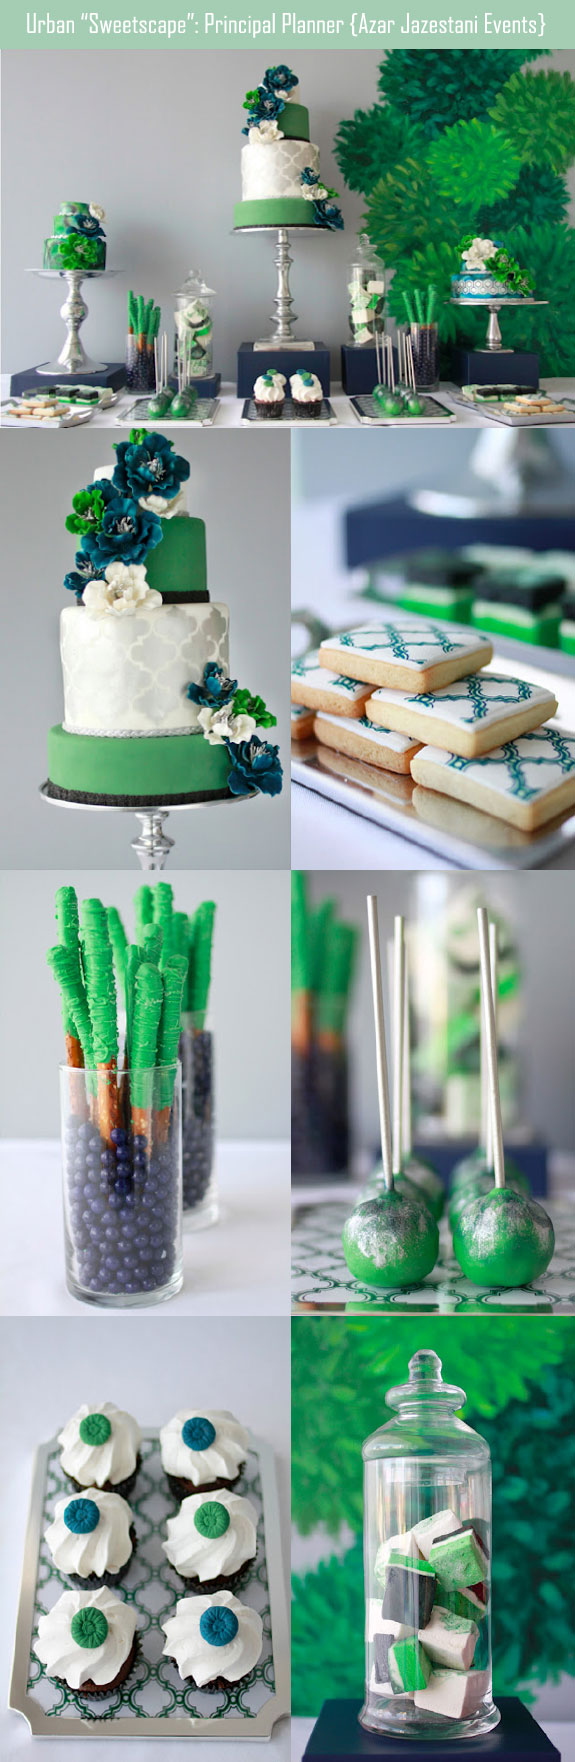 Green sweetscape